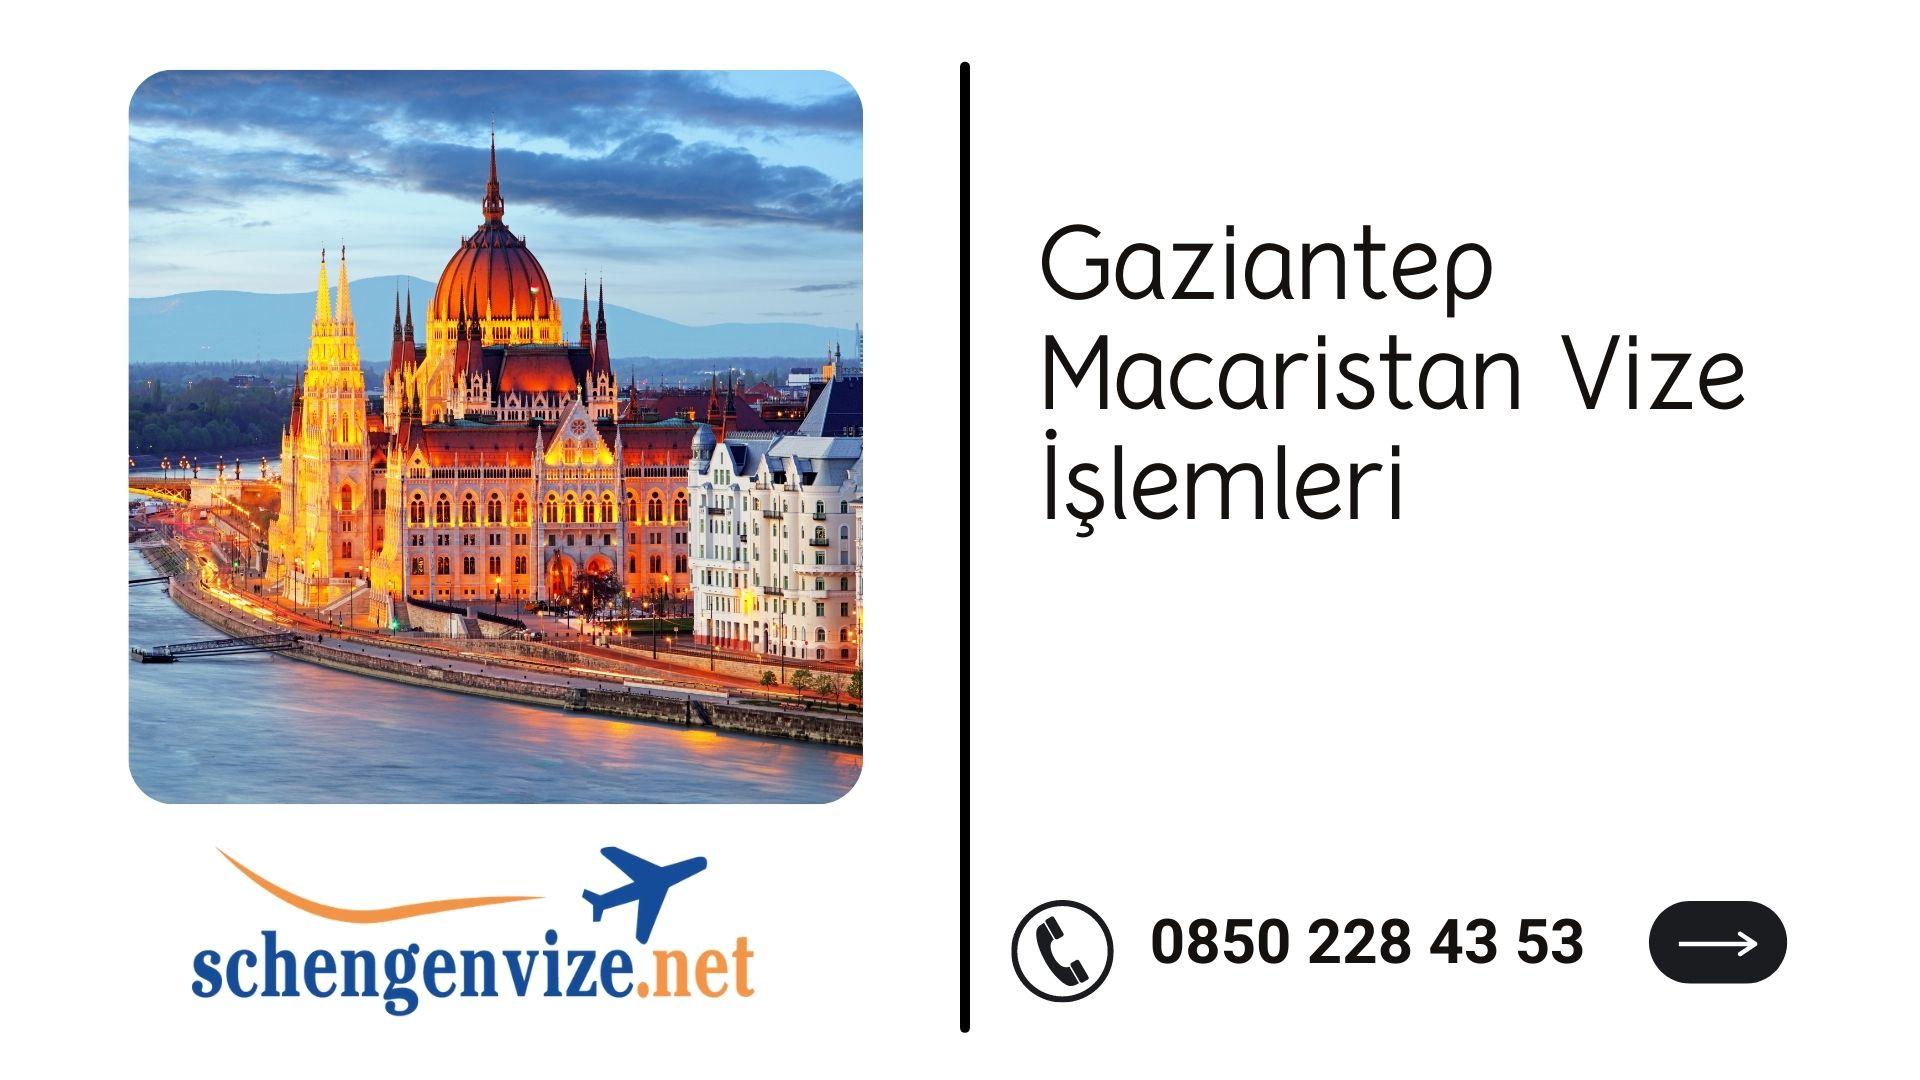 Gaziantep Macaristan Vize İşlemleri